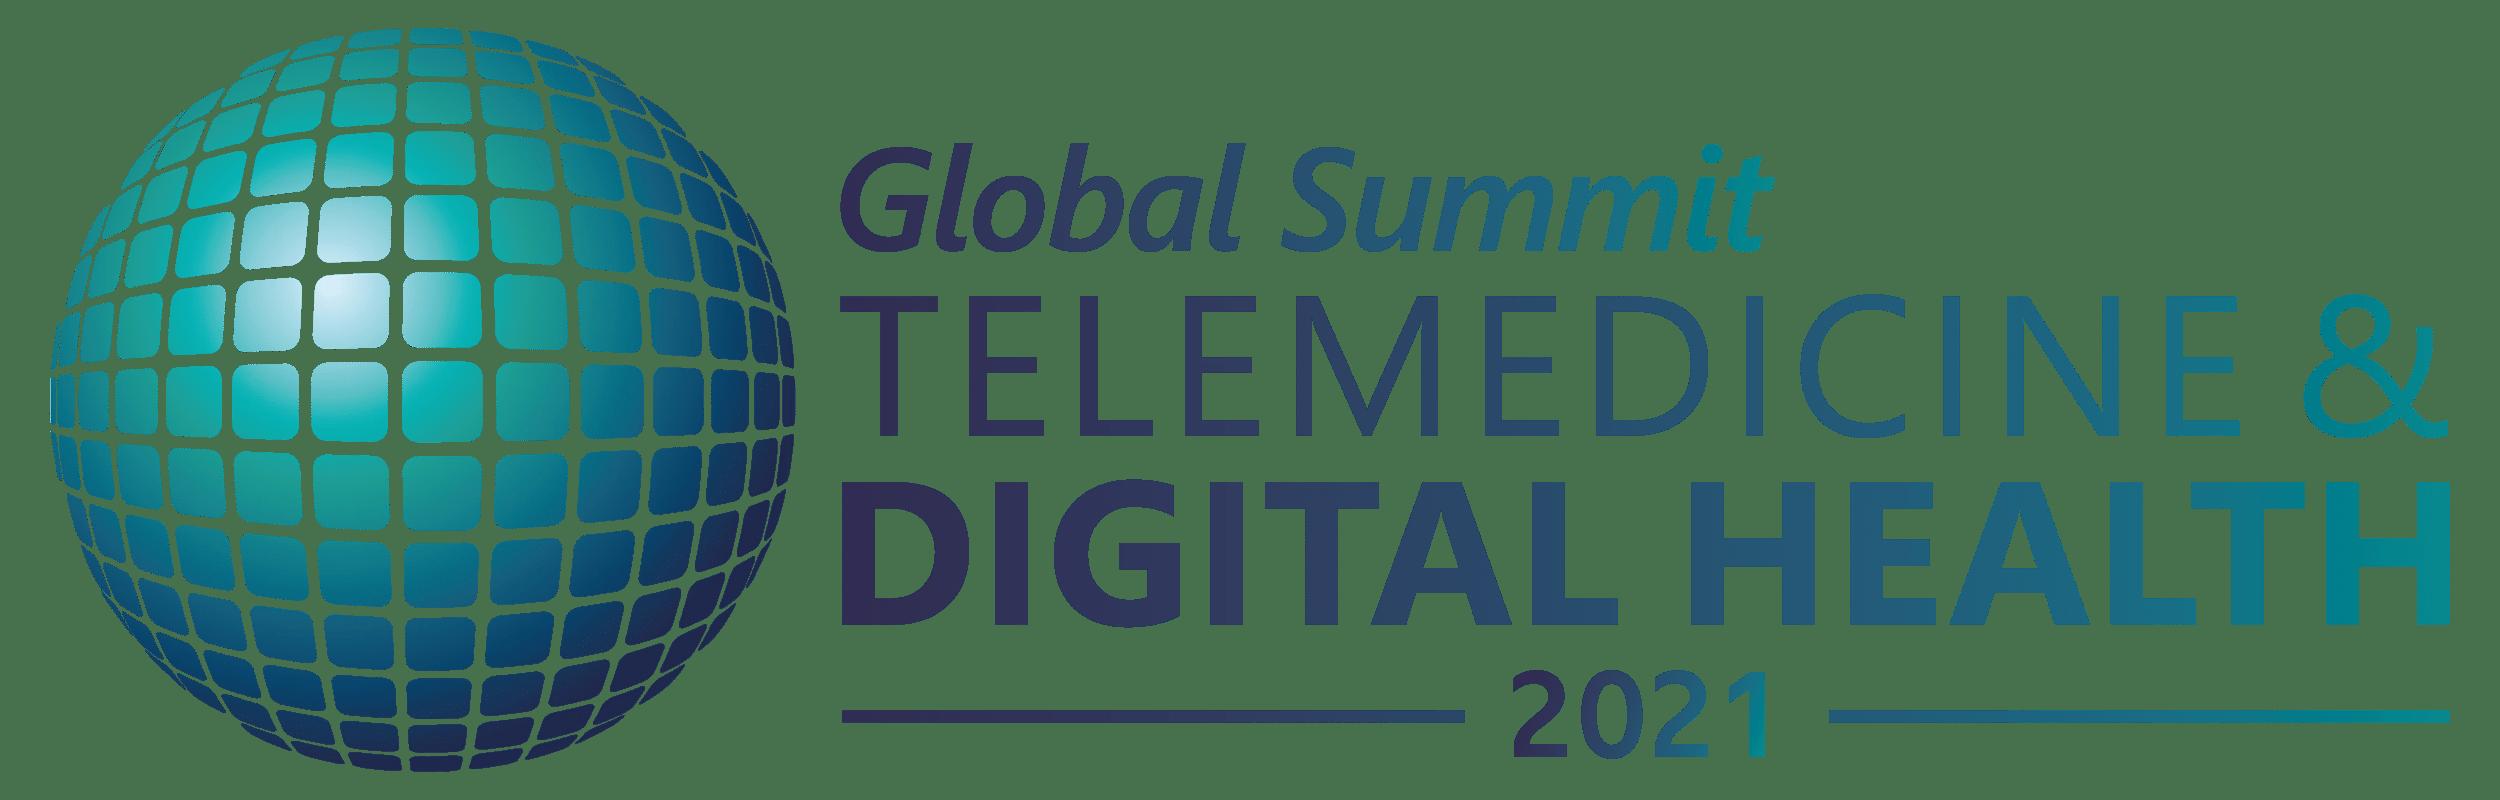 Global Summit 2021 | Telemedicine & Digital Health